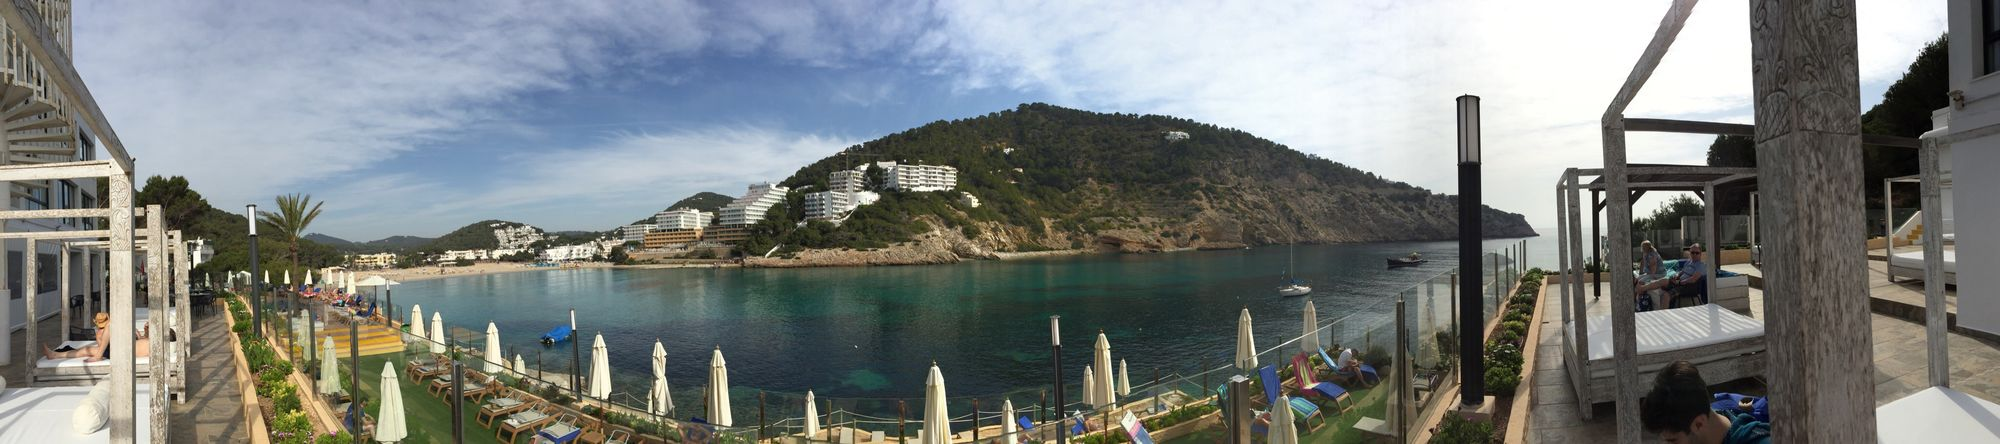 View Hotel Calallonga Paladium Ibiza Mar Cristal Clear Cristal Water Holiday Life Is A Beach